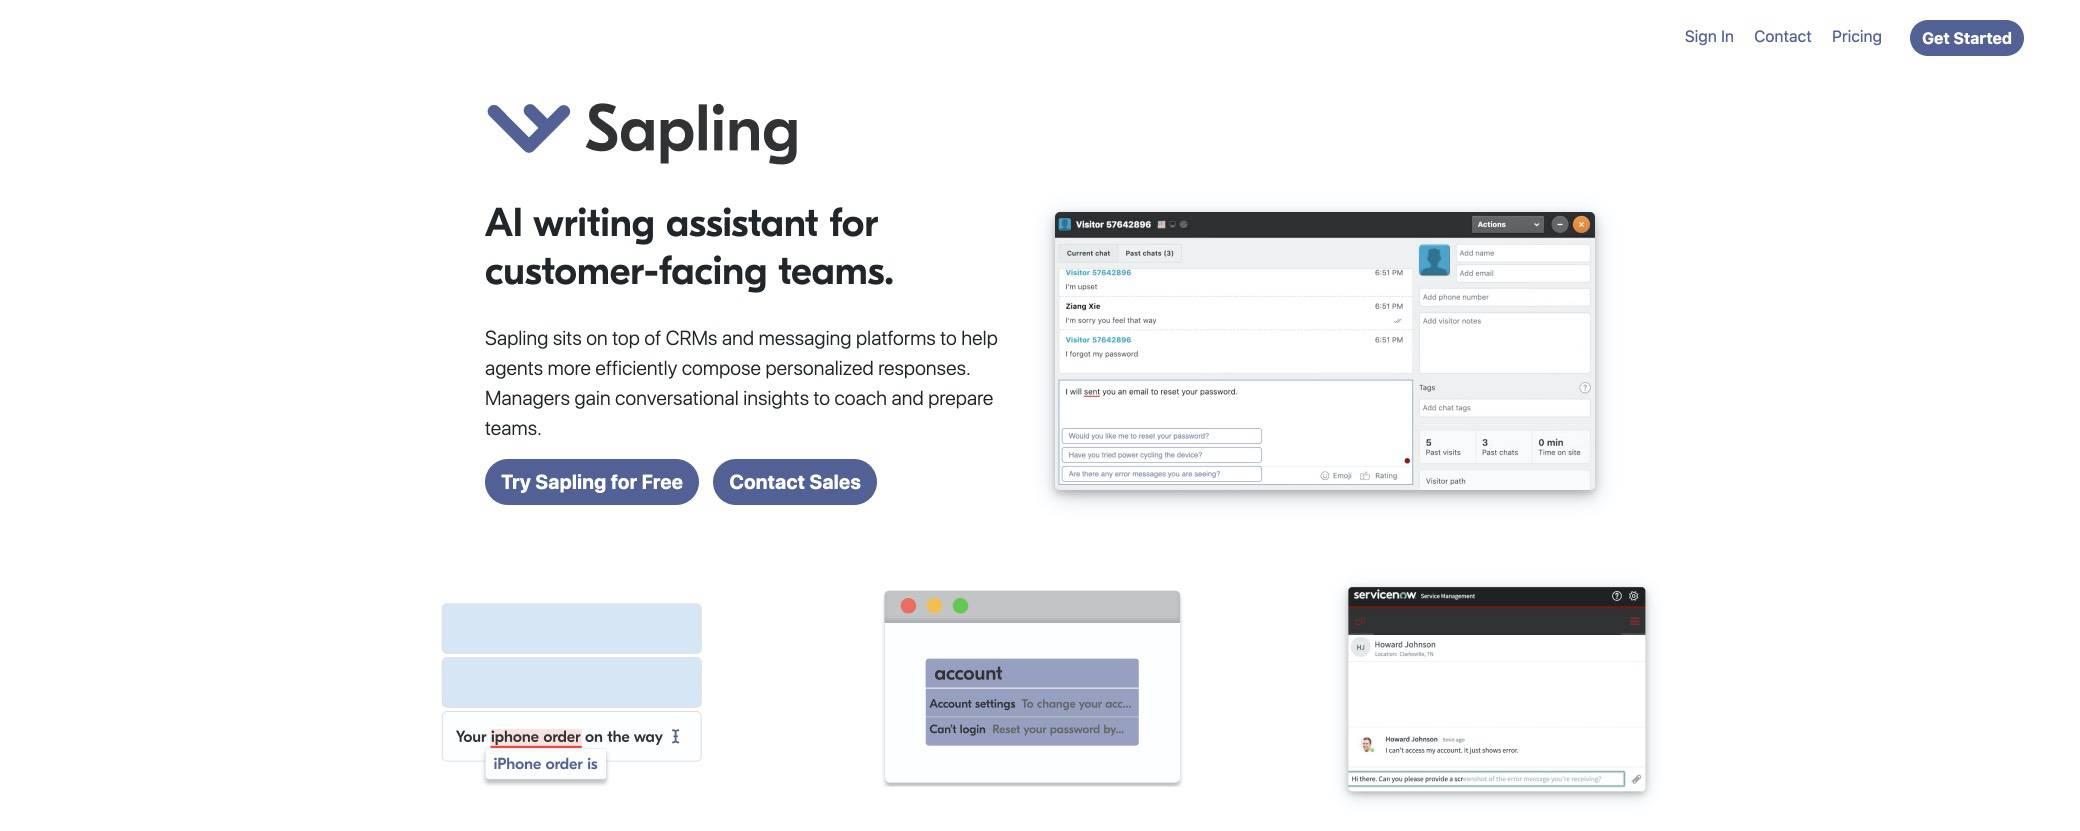 sapling screenshot